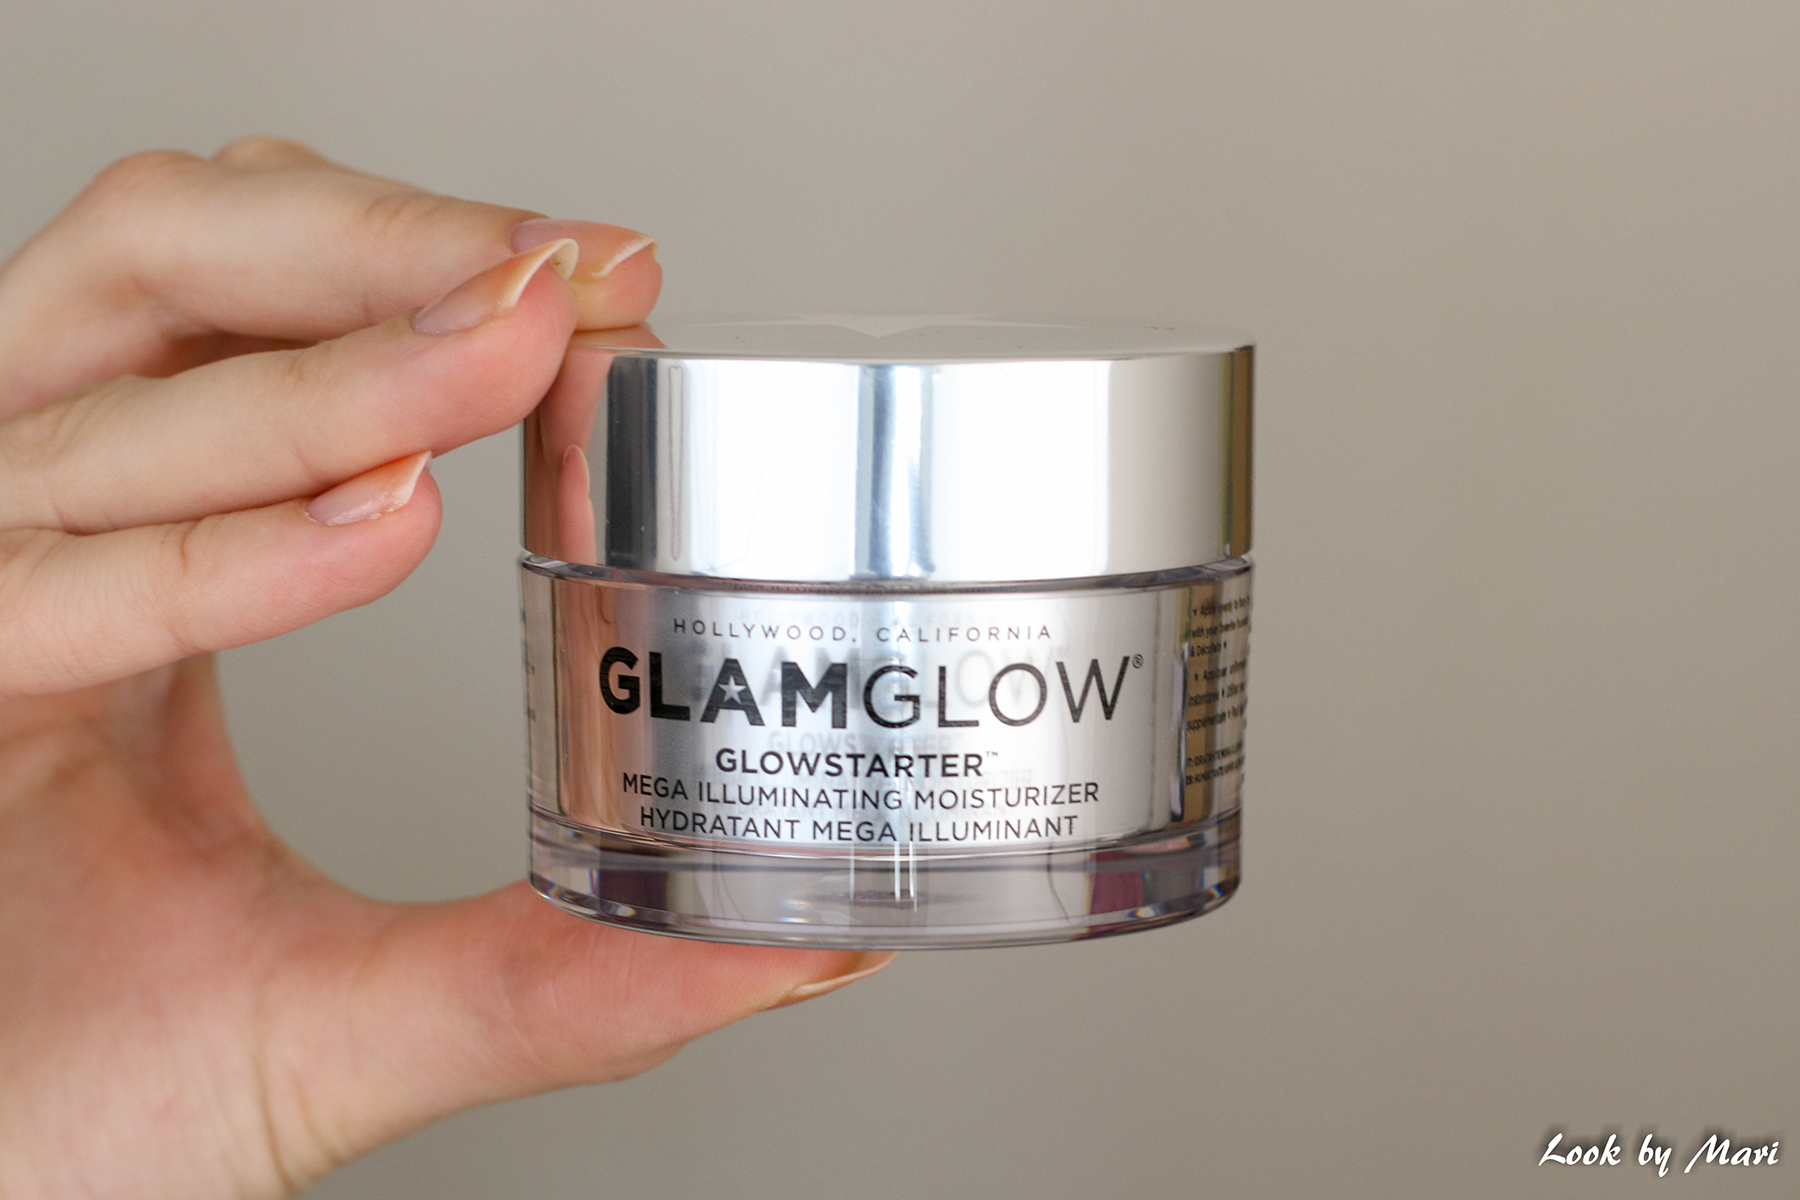 2 glamglow glowstarter mega illuminating moisturizer pearl glow review kokemuksia